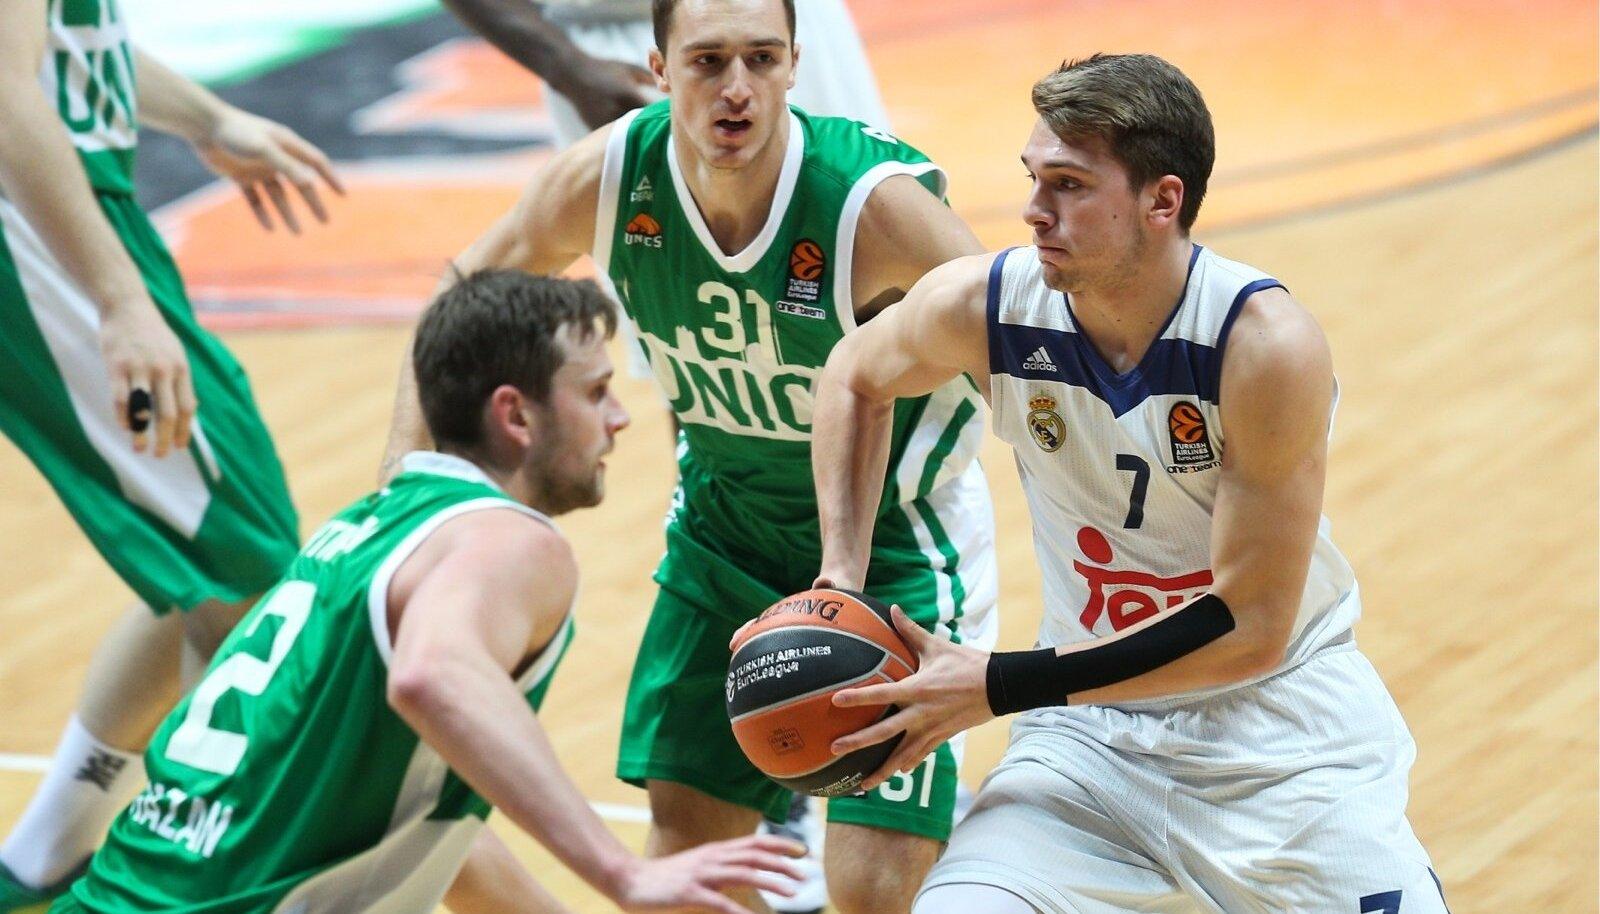 Euroleague Basketball: UNICS Kazan 77 - 81 Real Madrid